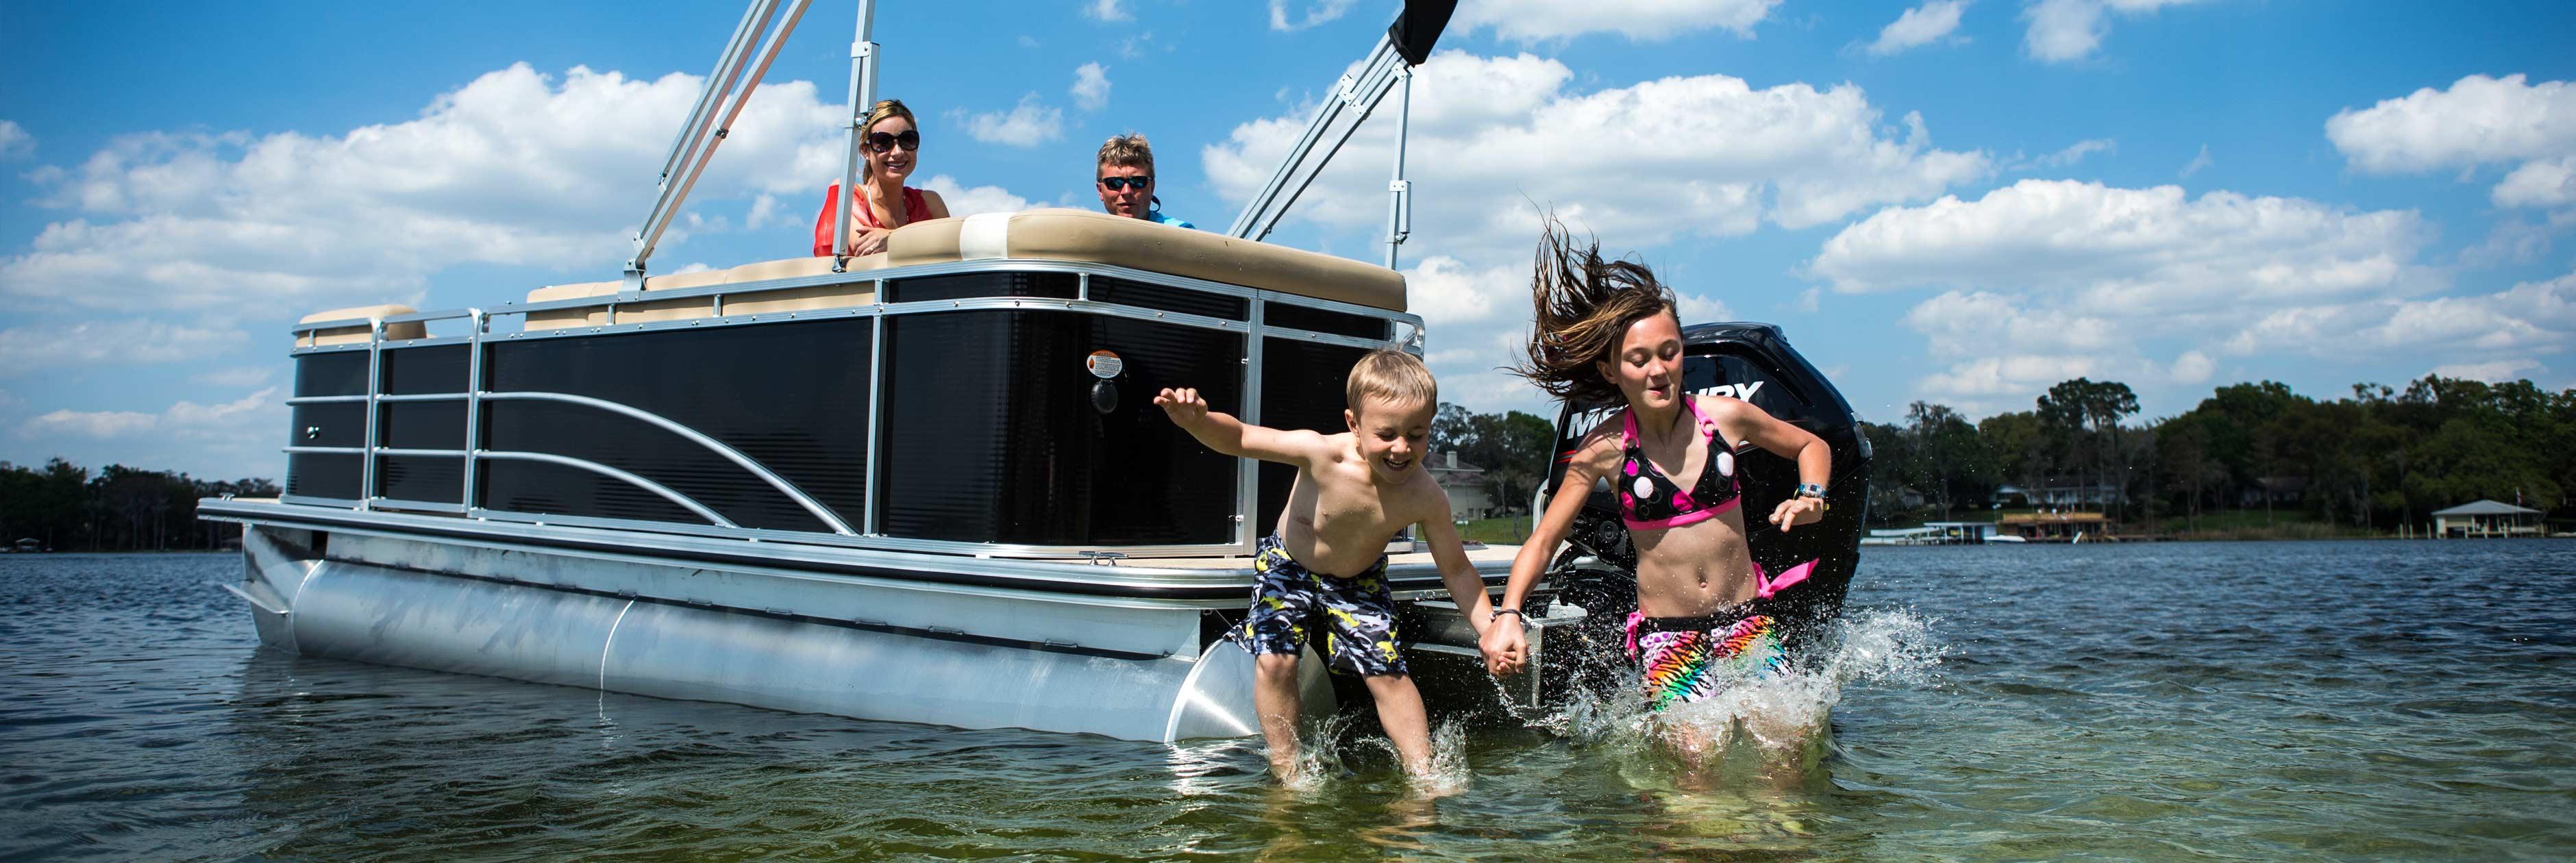 Why Buy a Pontoon or Tritoon Boat